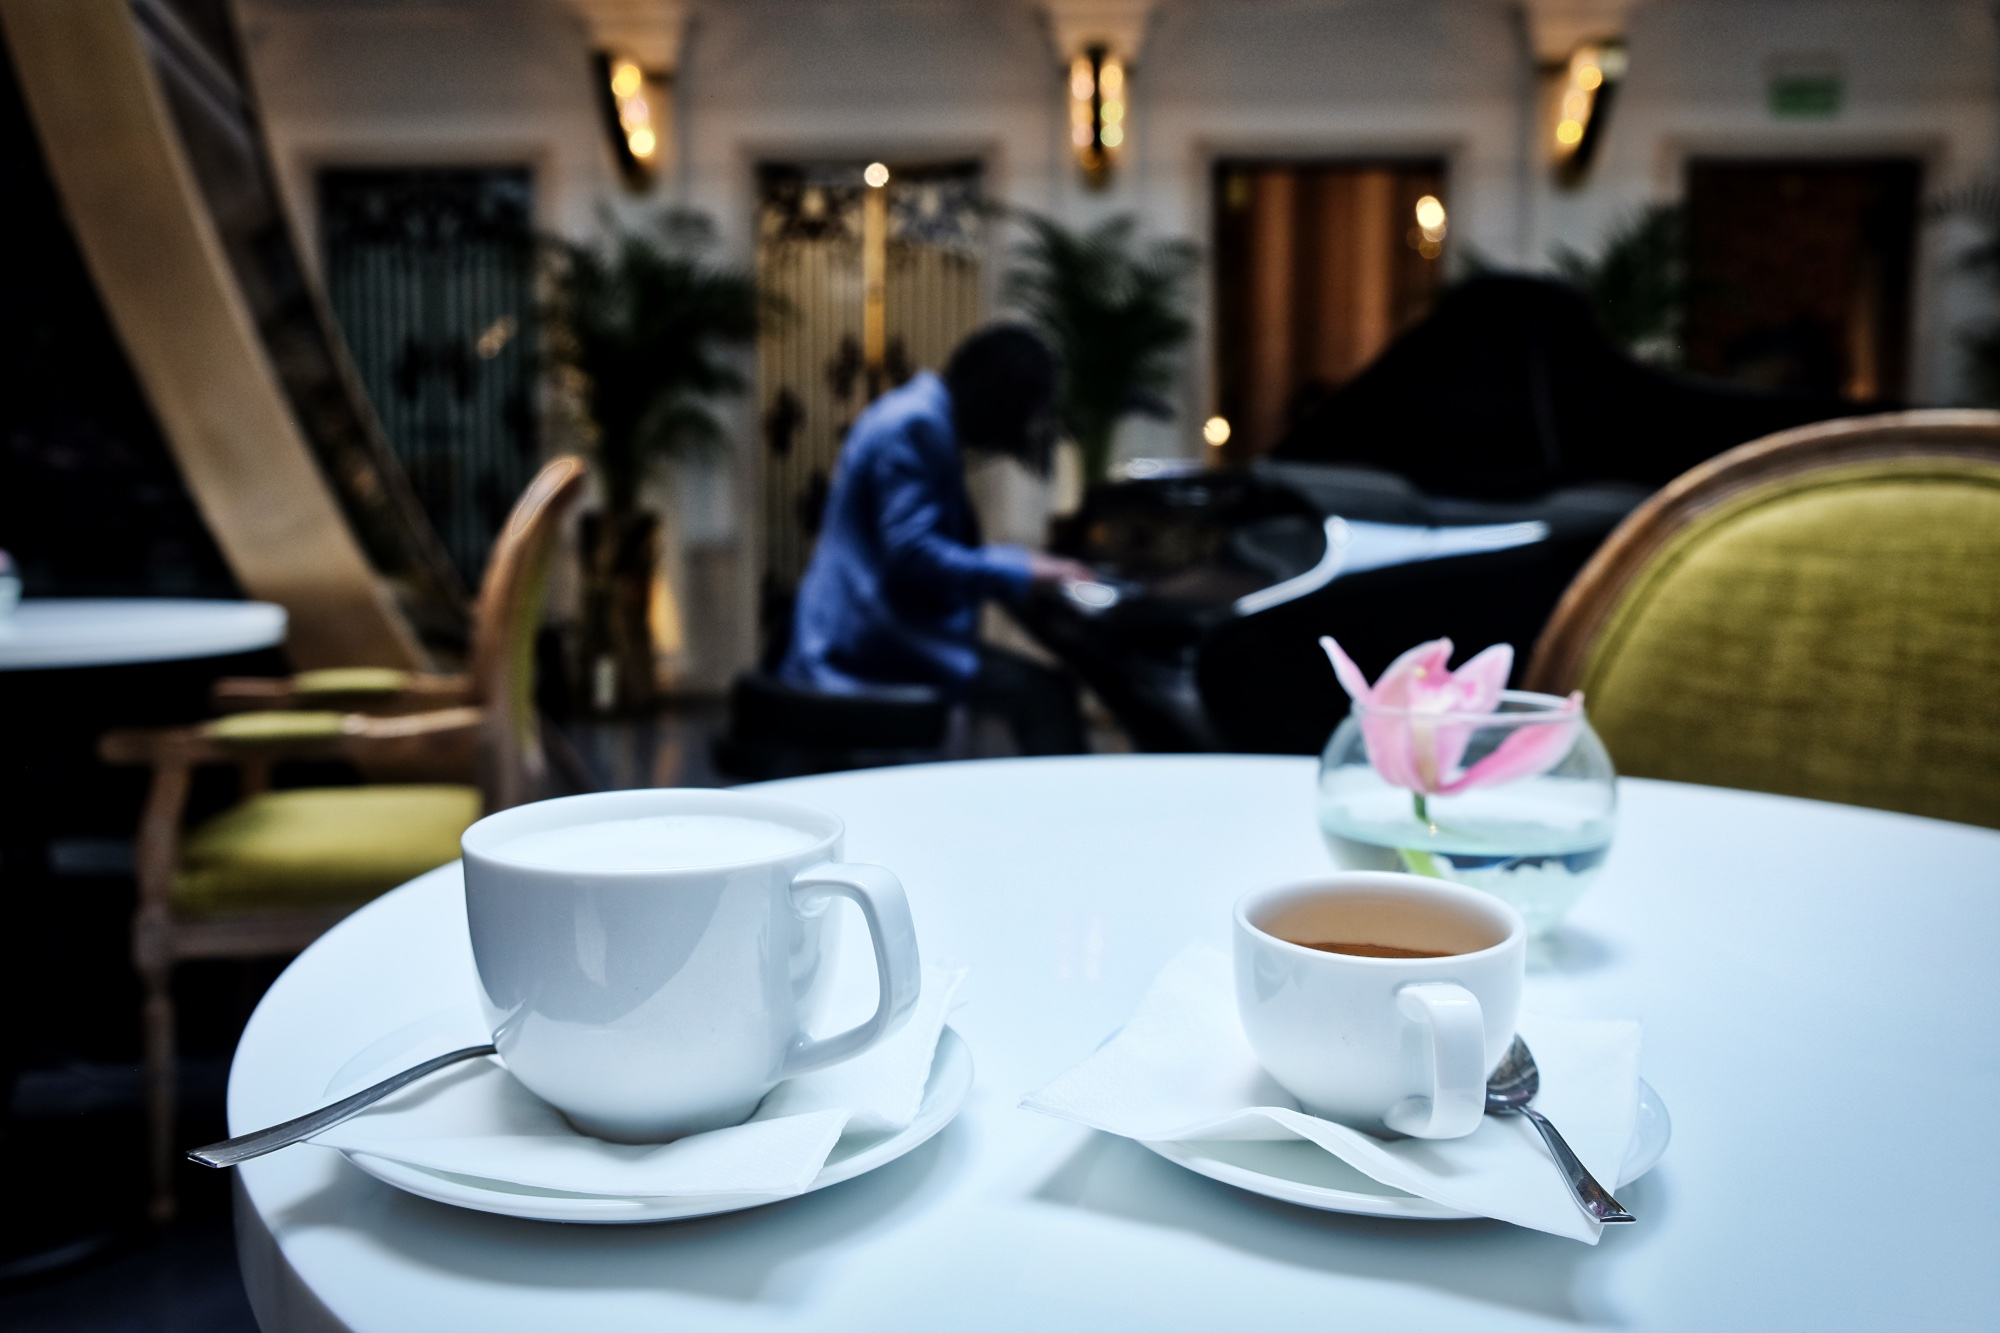 dscf2396_aria_liszt_etterem_hotel_budapest_vilagevo_jokuti_andras_l.jpeg